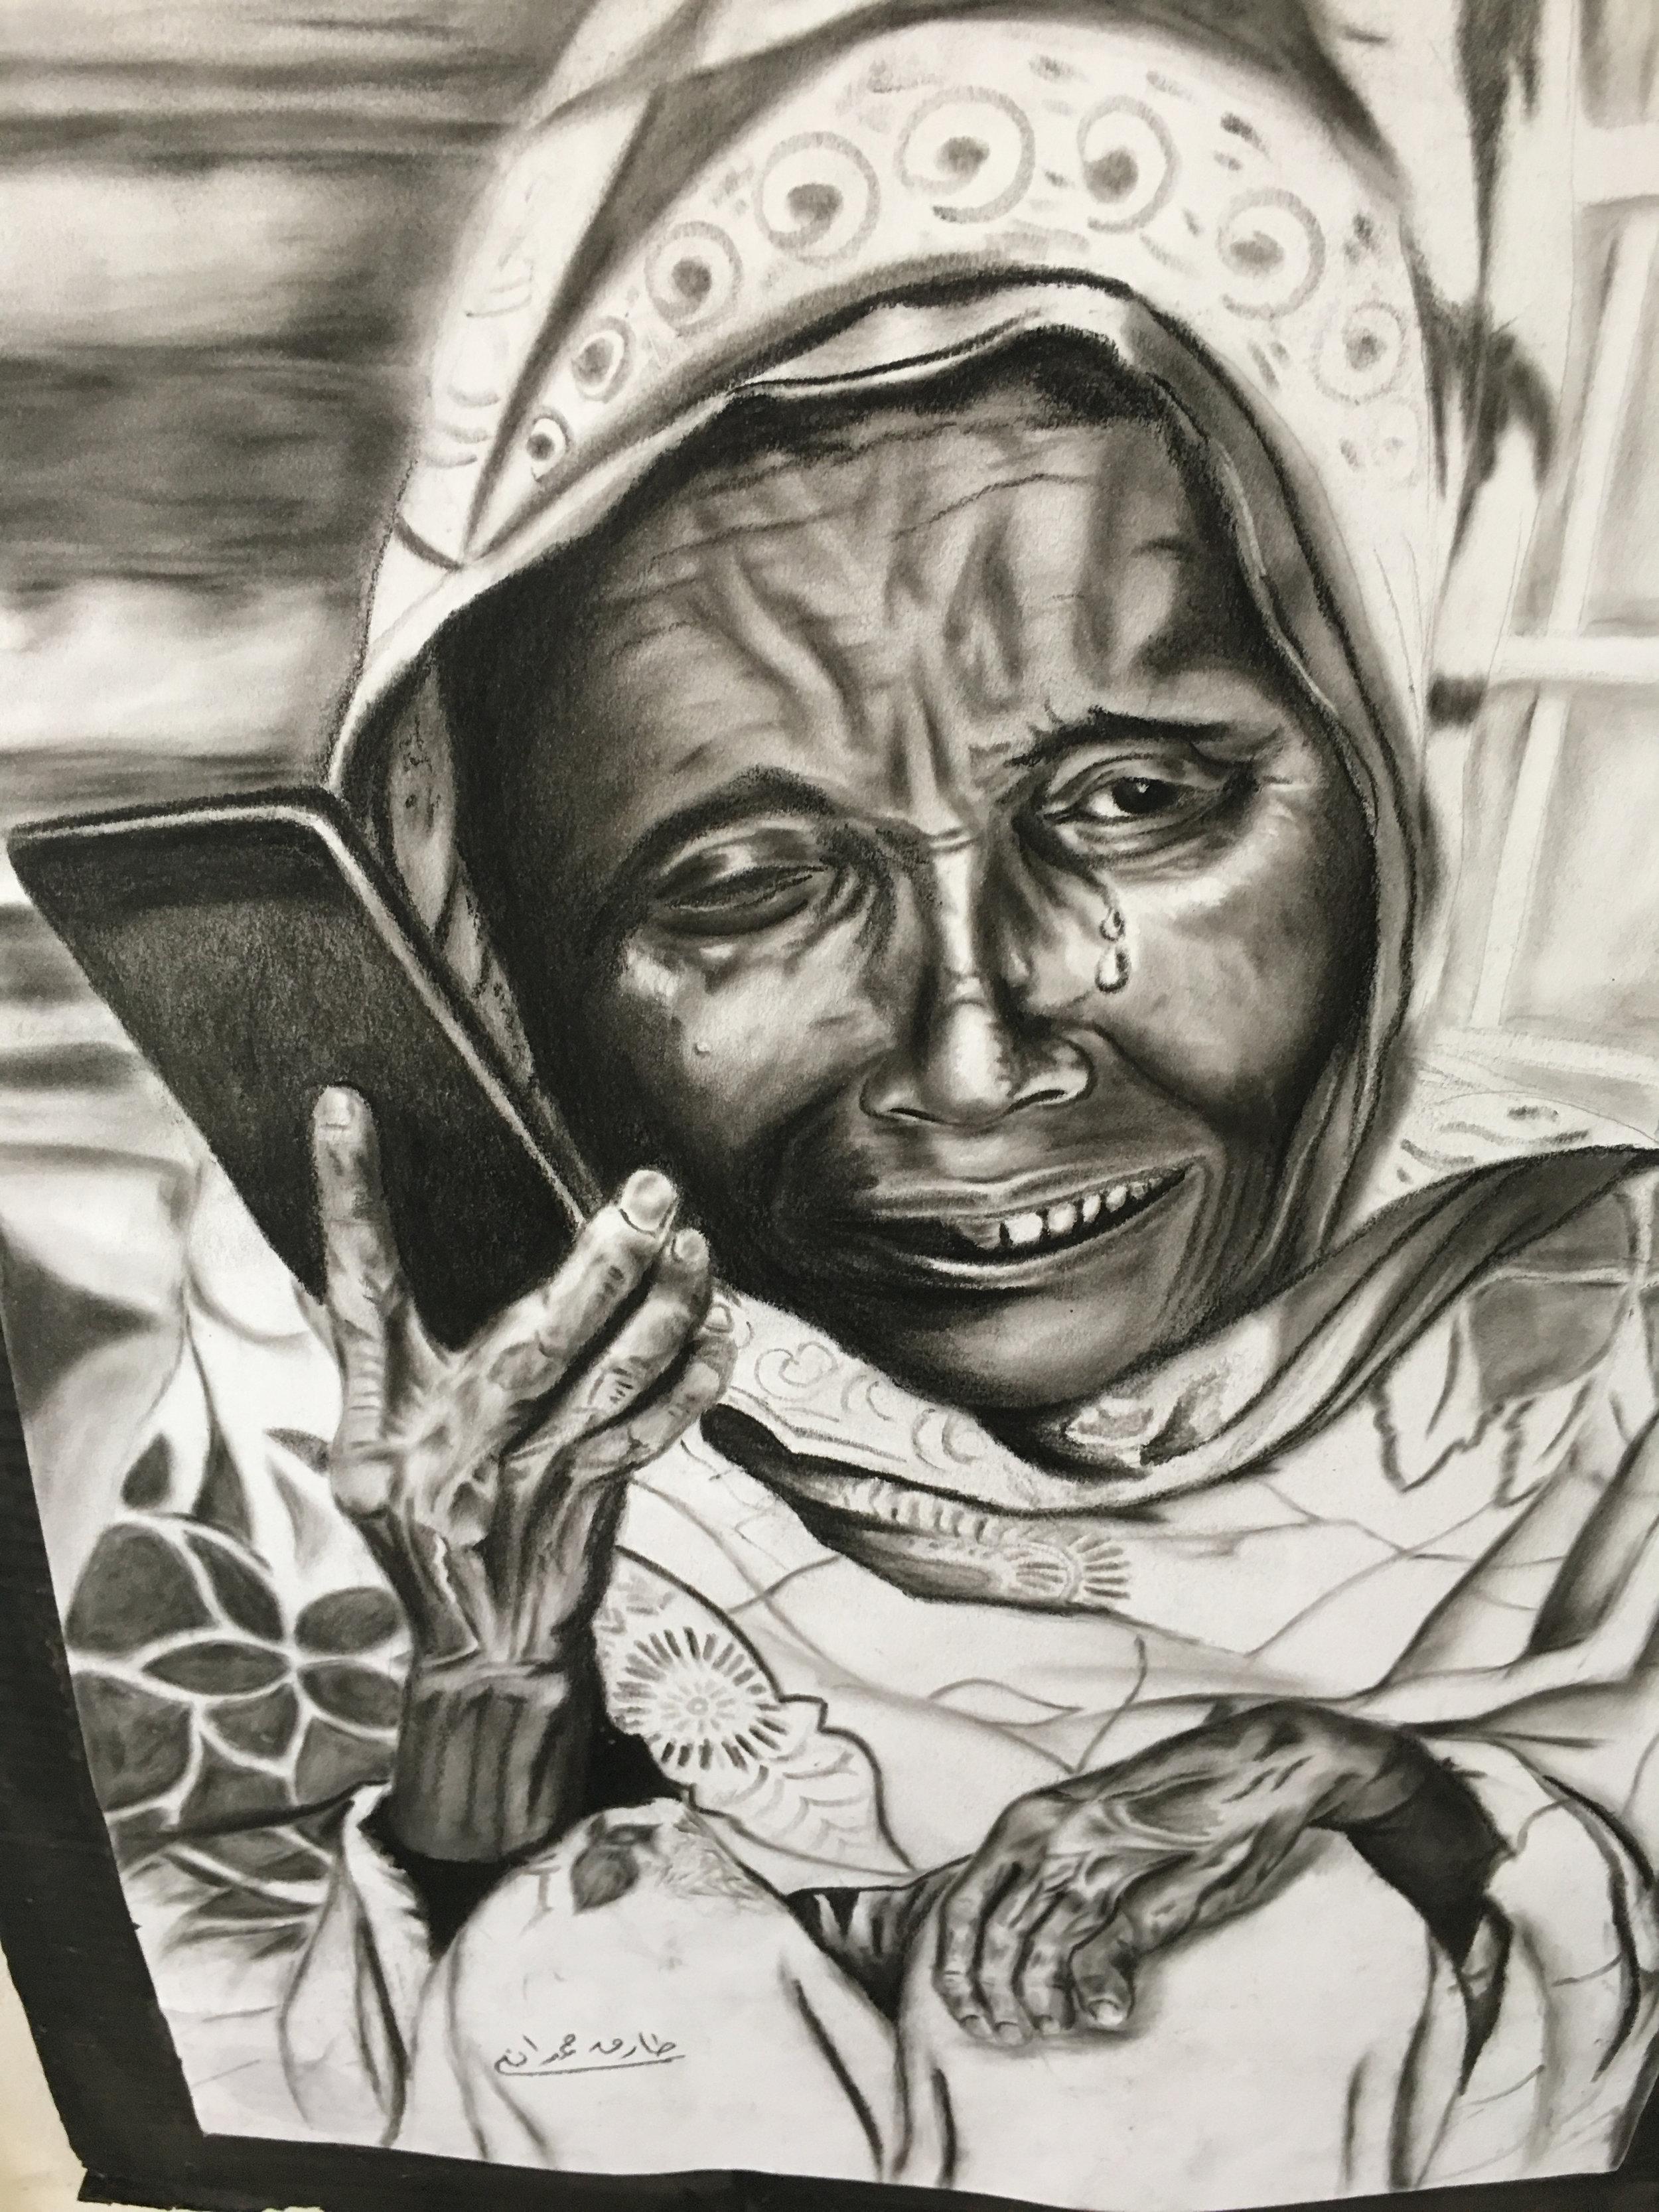 Art in Za'atari expresses the ineffable